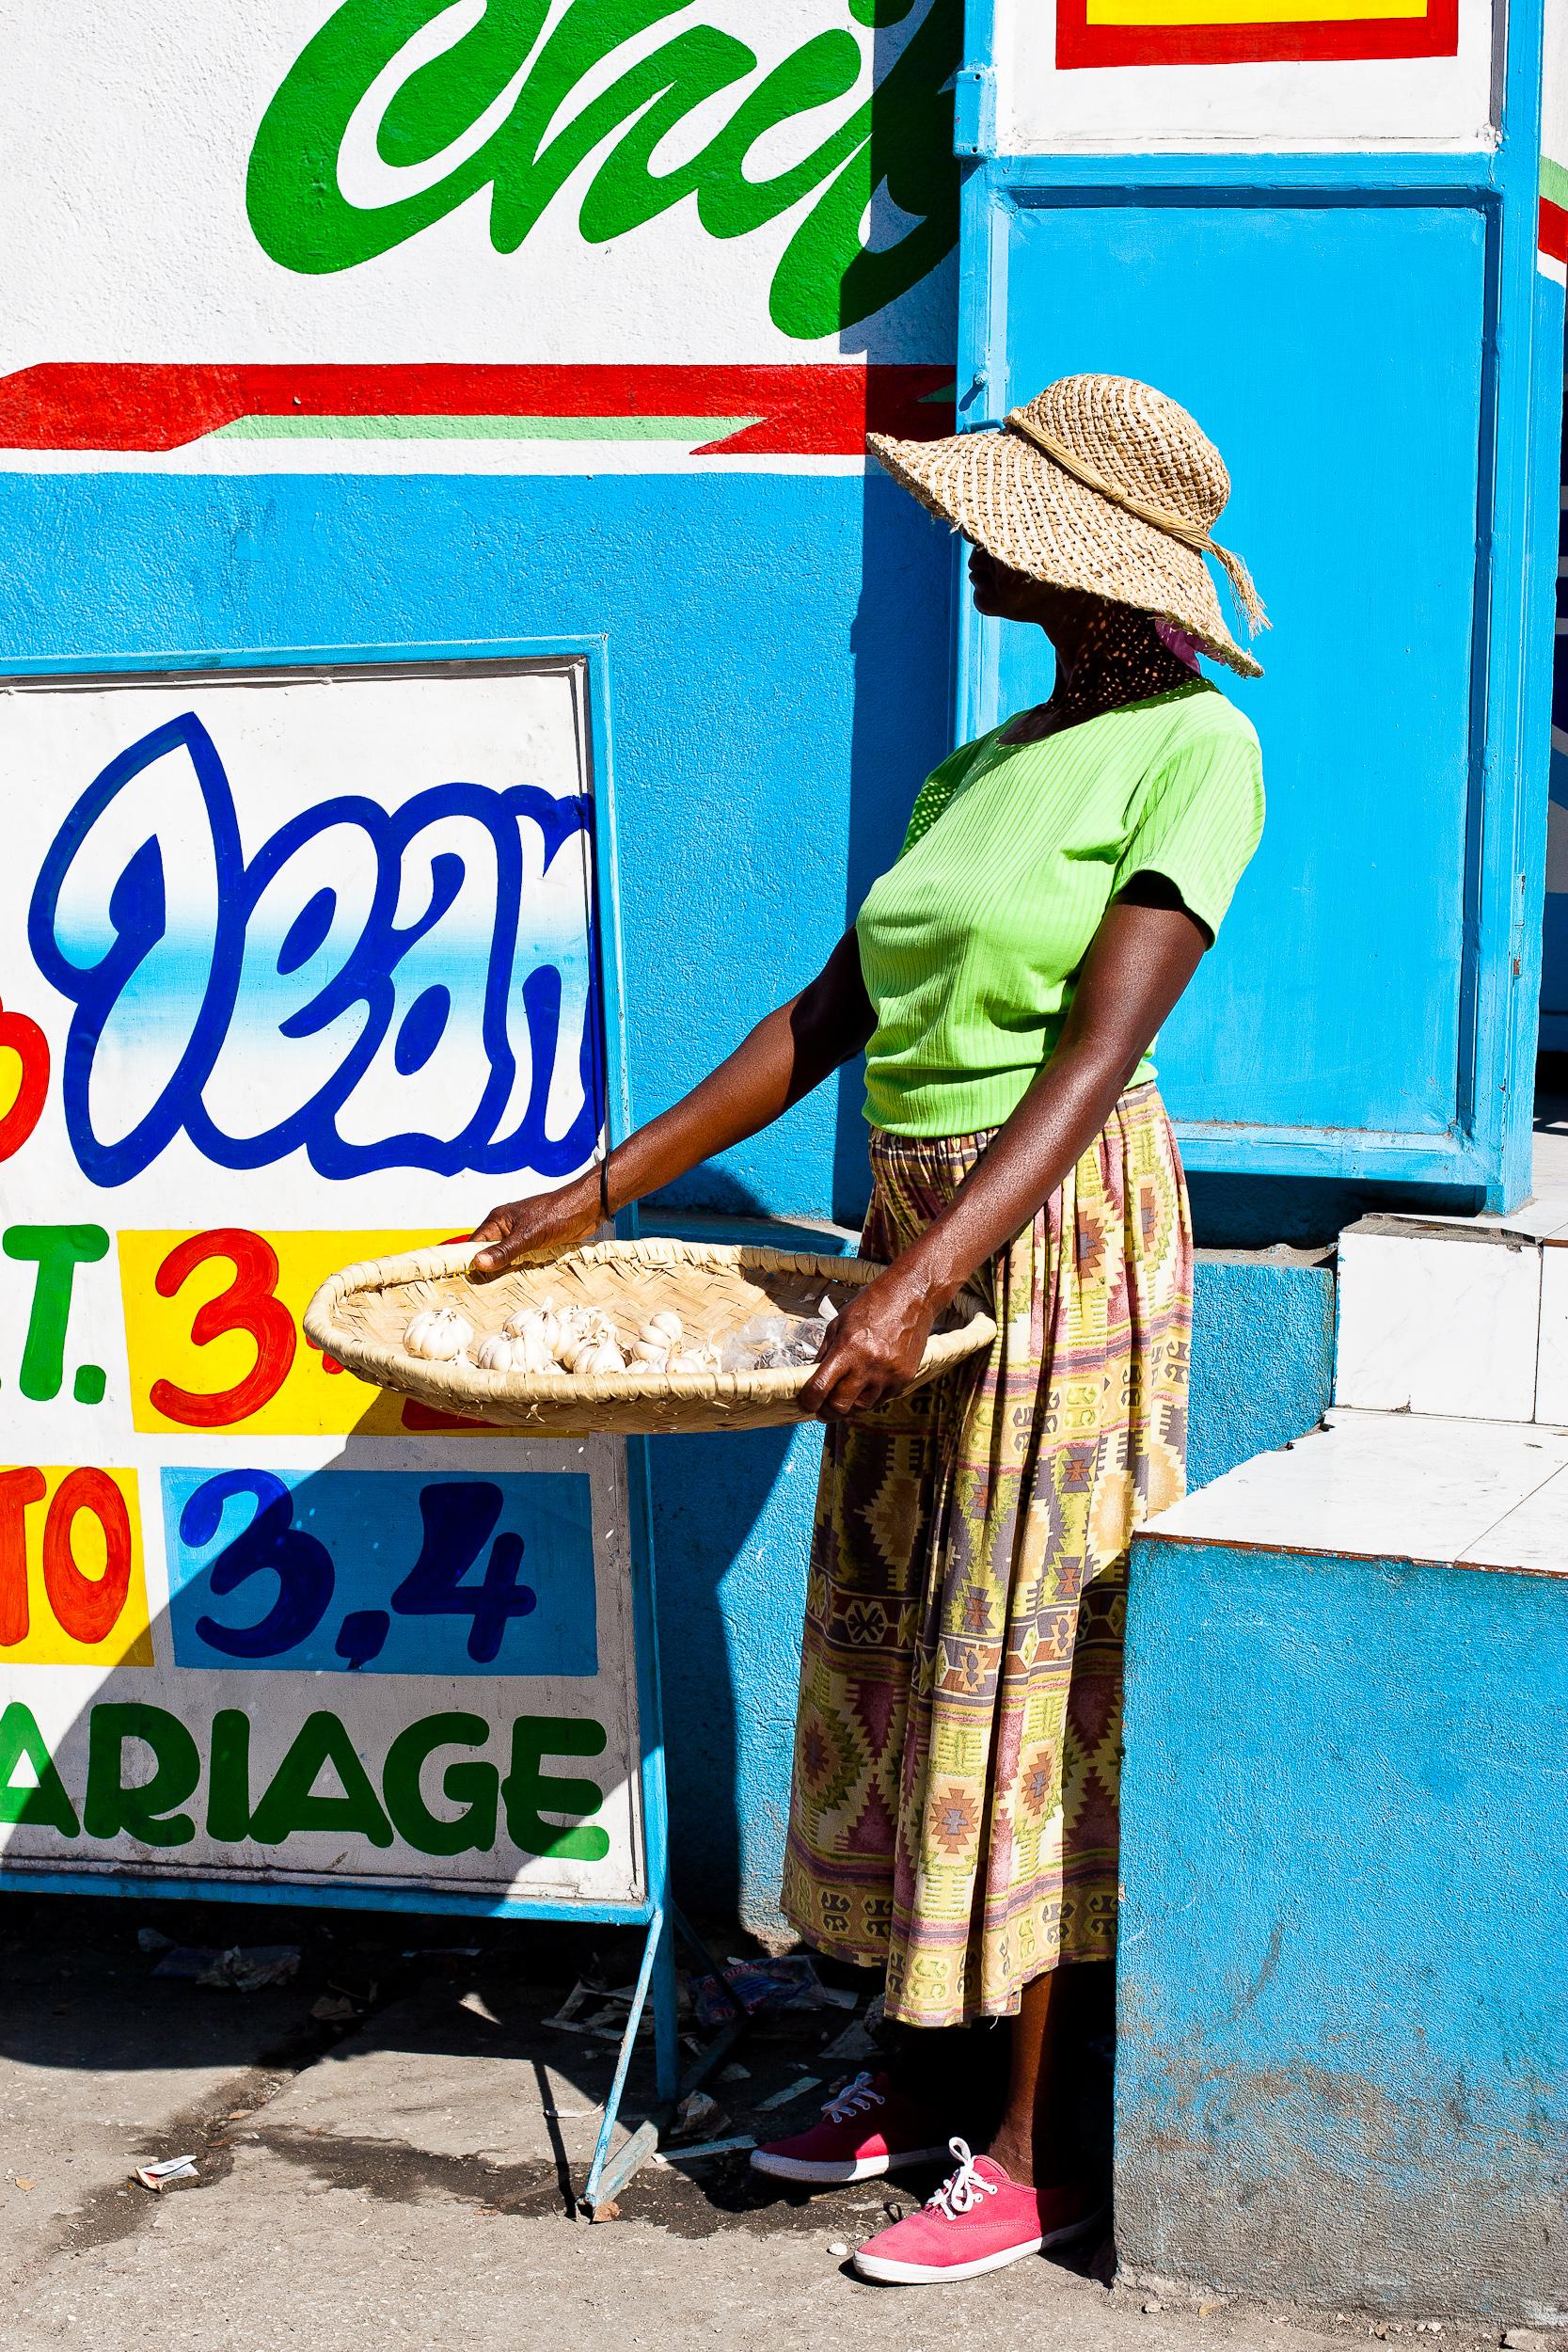 HAITI_13 décembre 2007_09h59m03.jpg